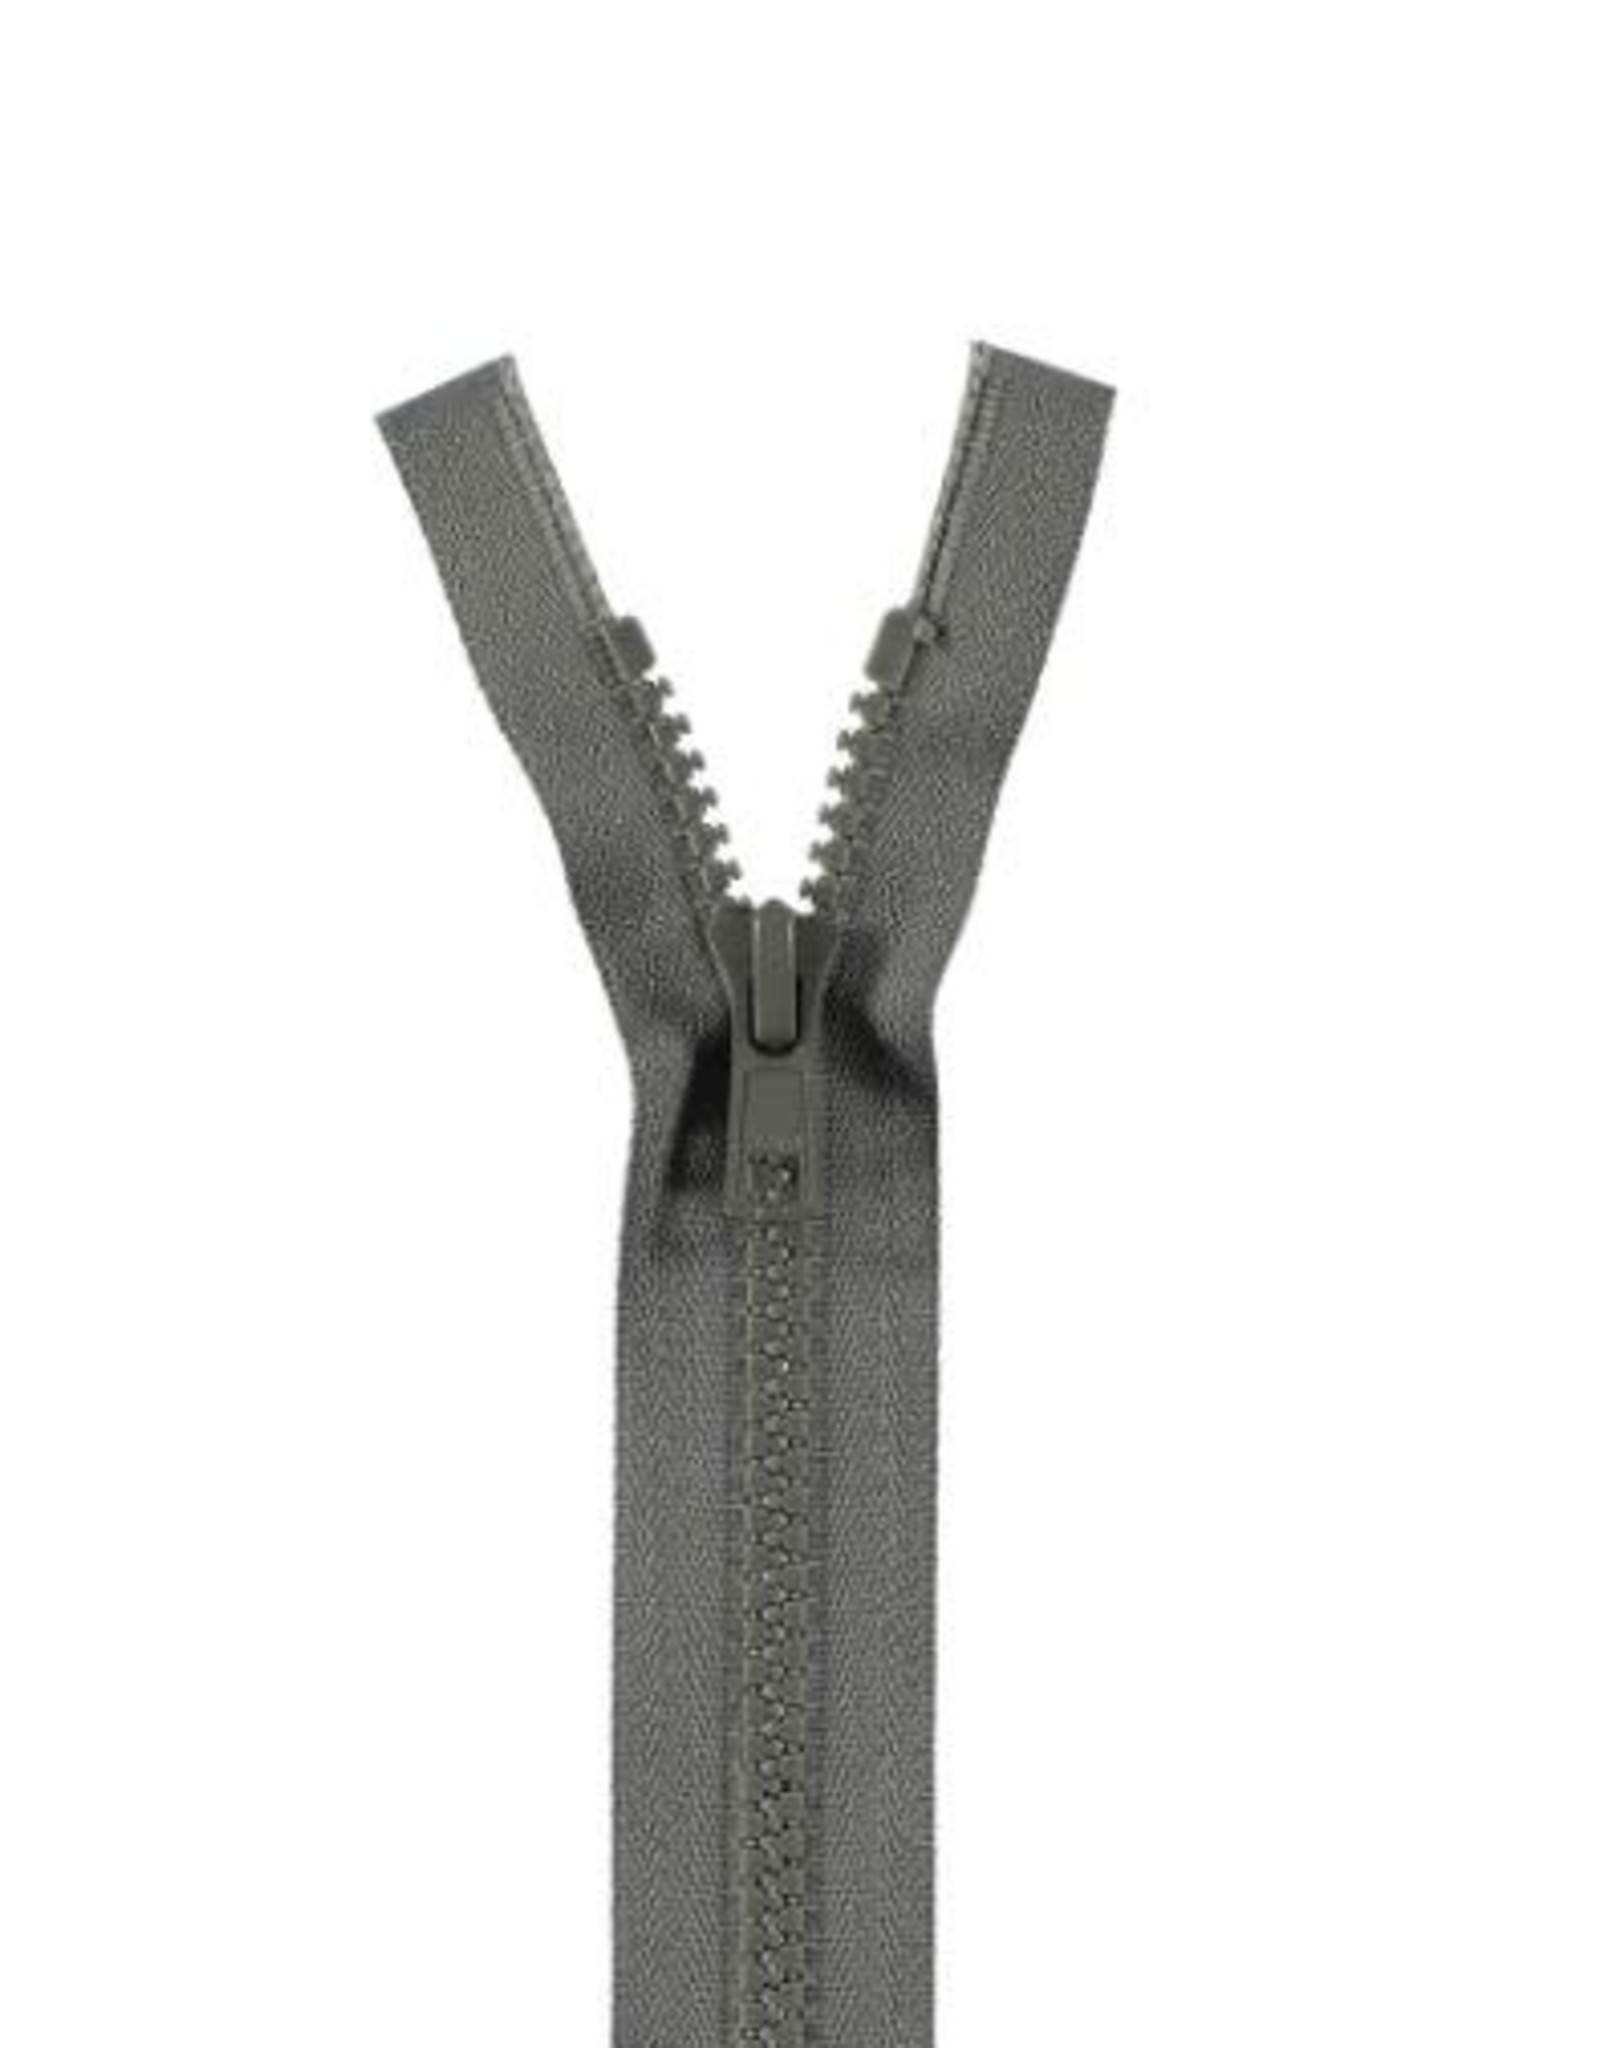 YKK BLOKRITS 5 DEELBAAR grijs 578-25cm